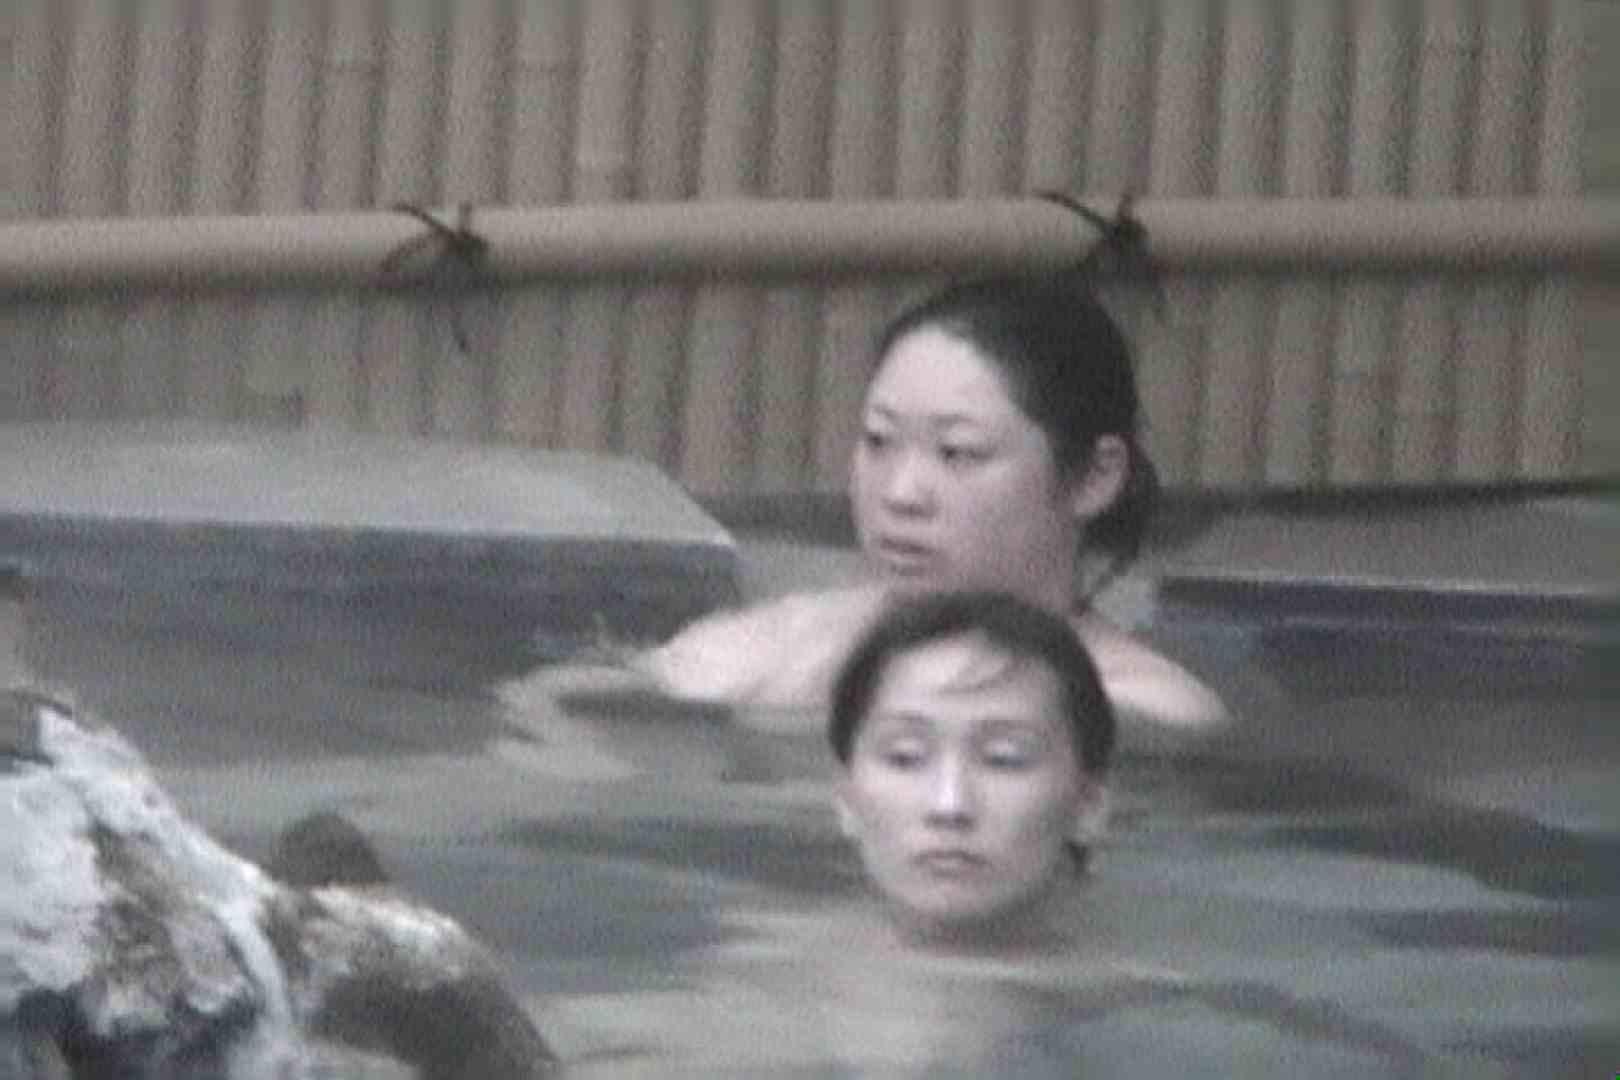 Aquaな露天風呂Vol.557 露天 | OL女体  40連発 19